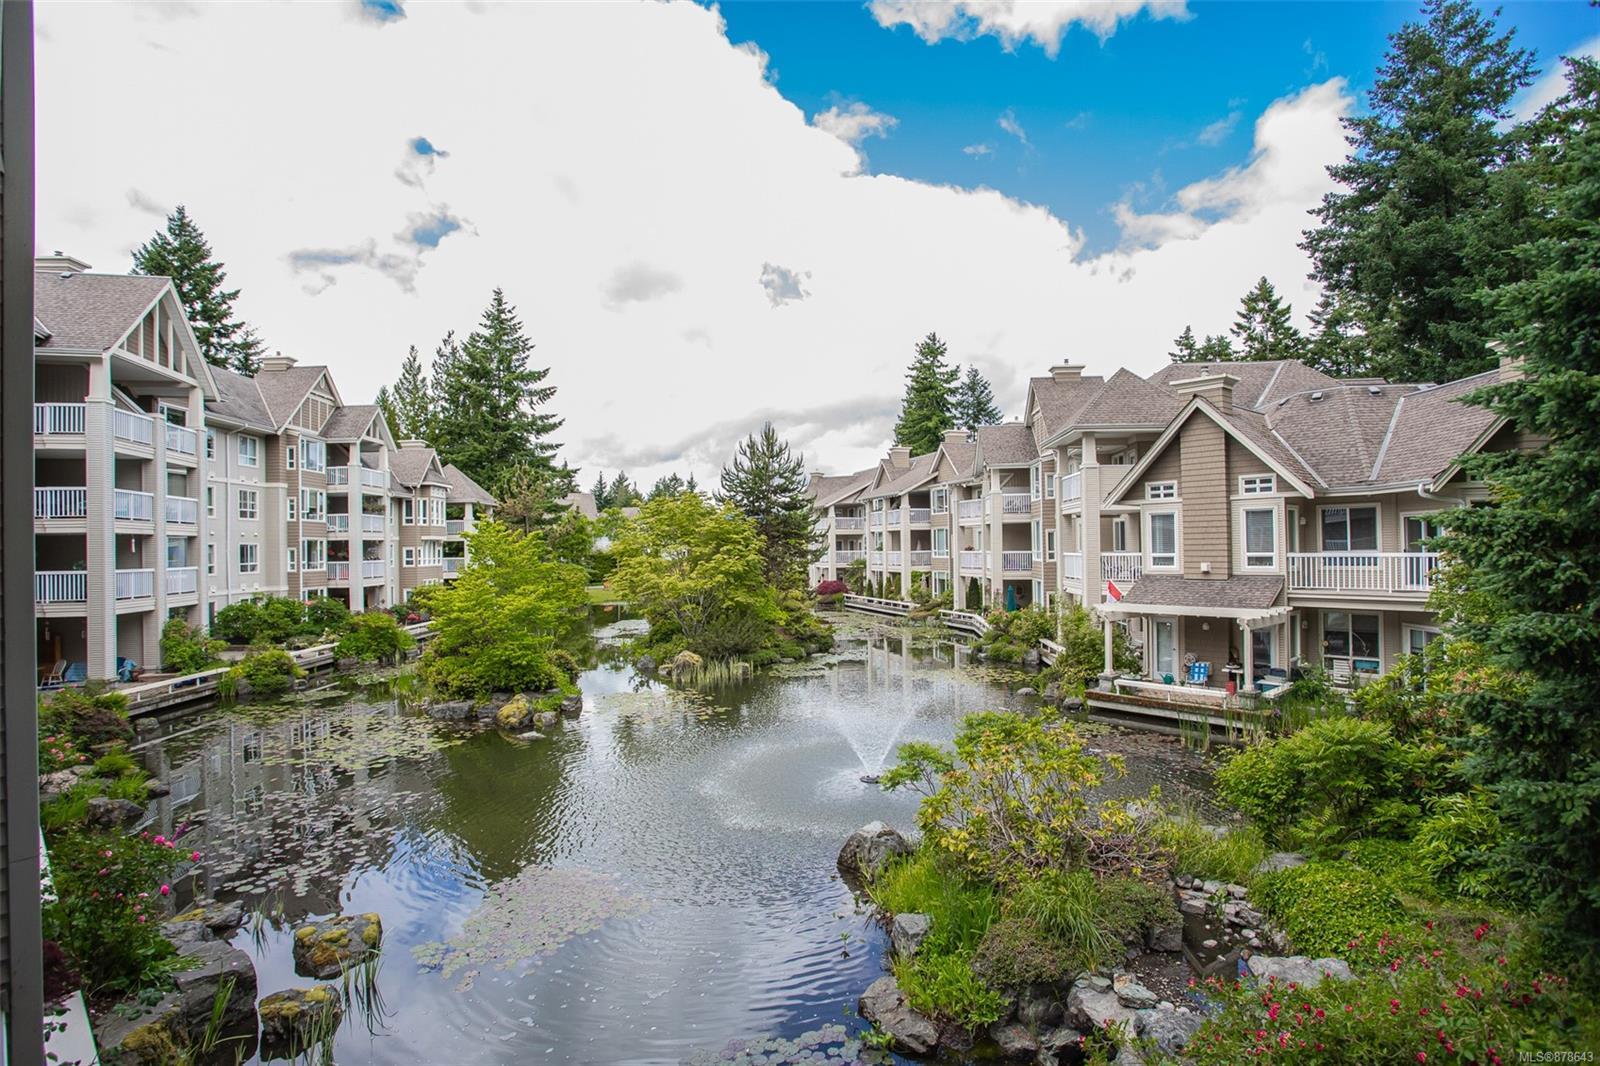 204 - 5685 Edgewater Lane, Nanaimo photo number 2